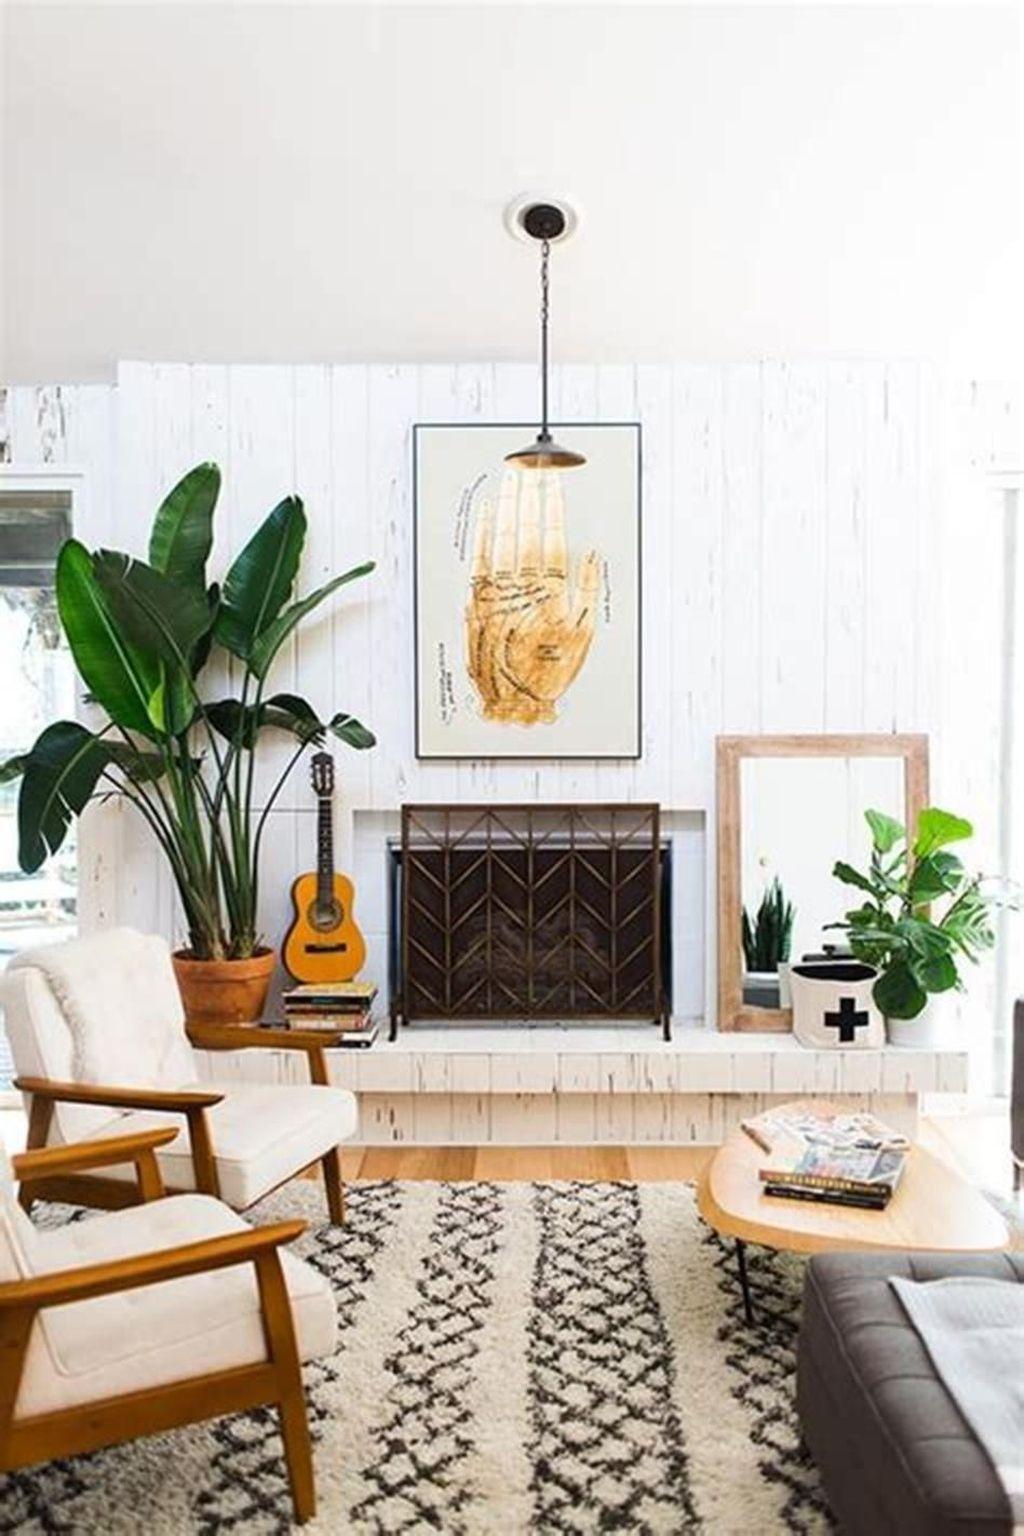 33 The Best Contemporary Living Room Design And Decor Ideas